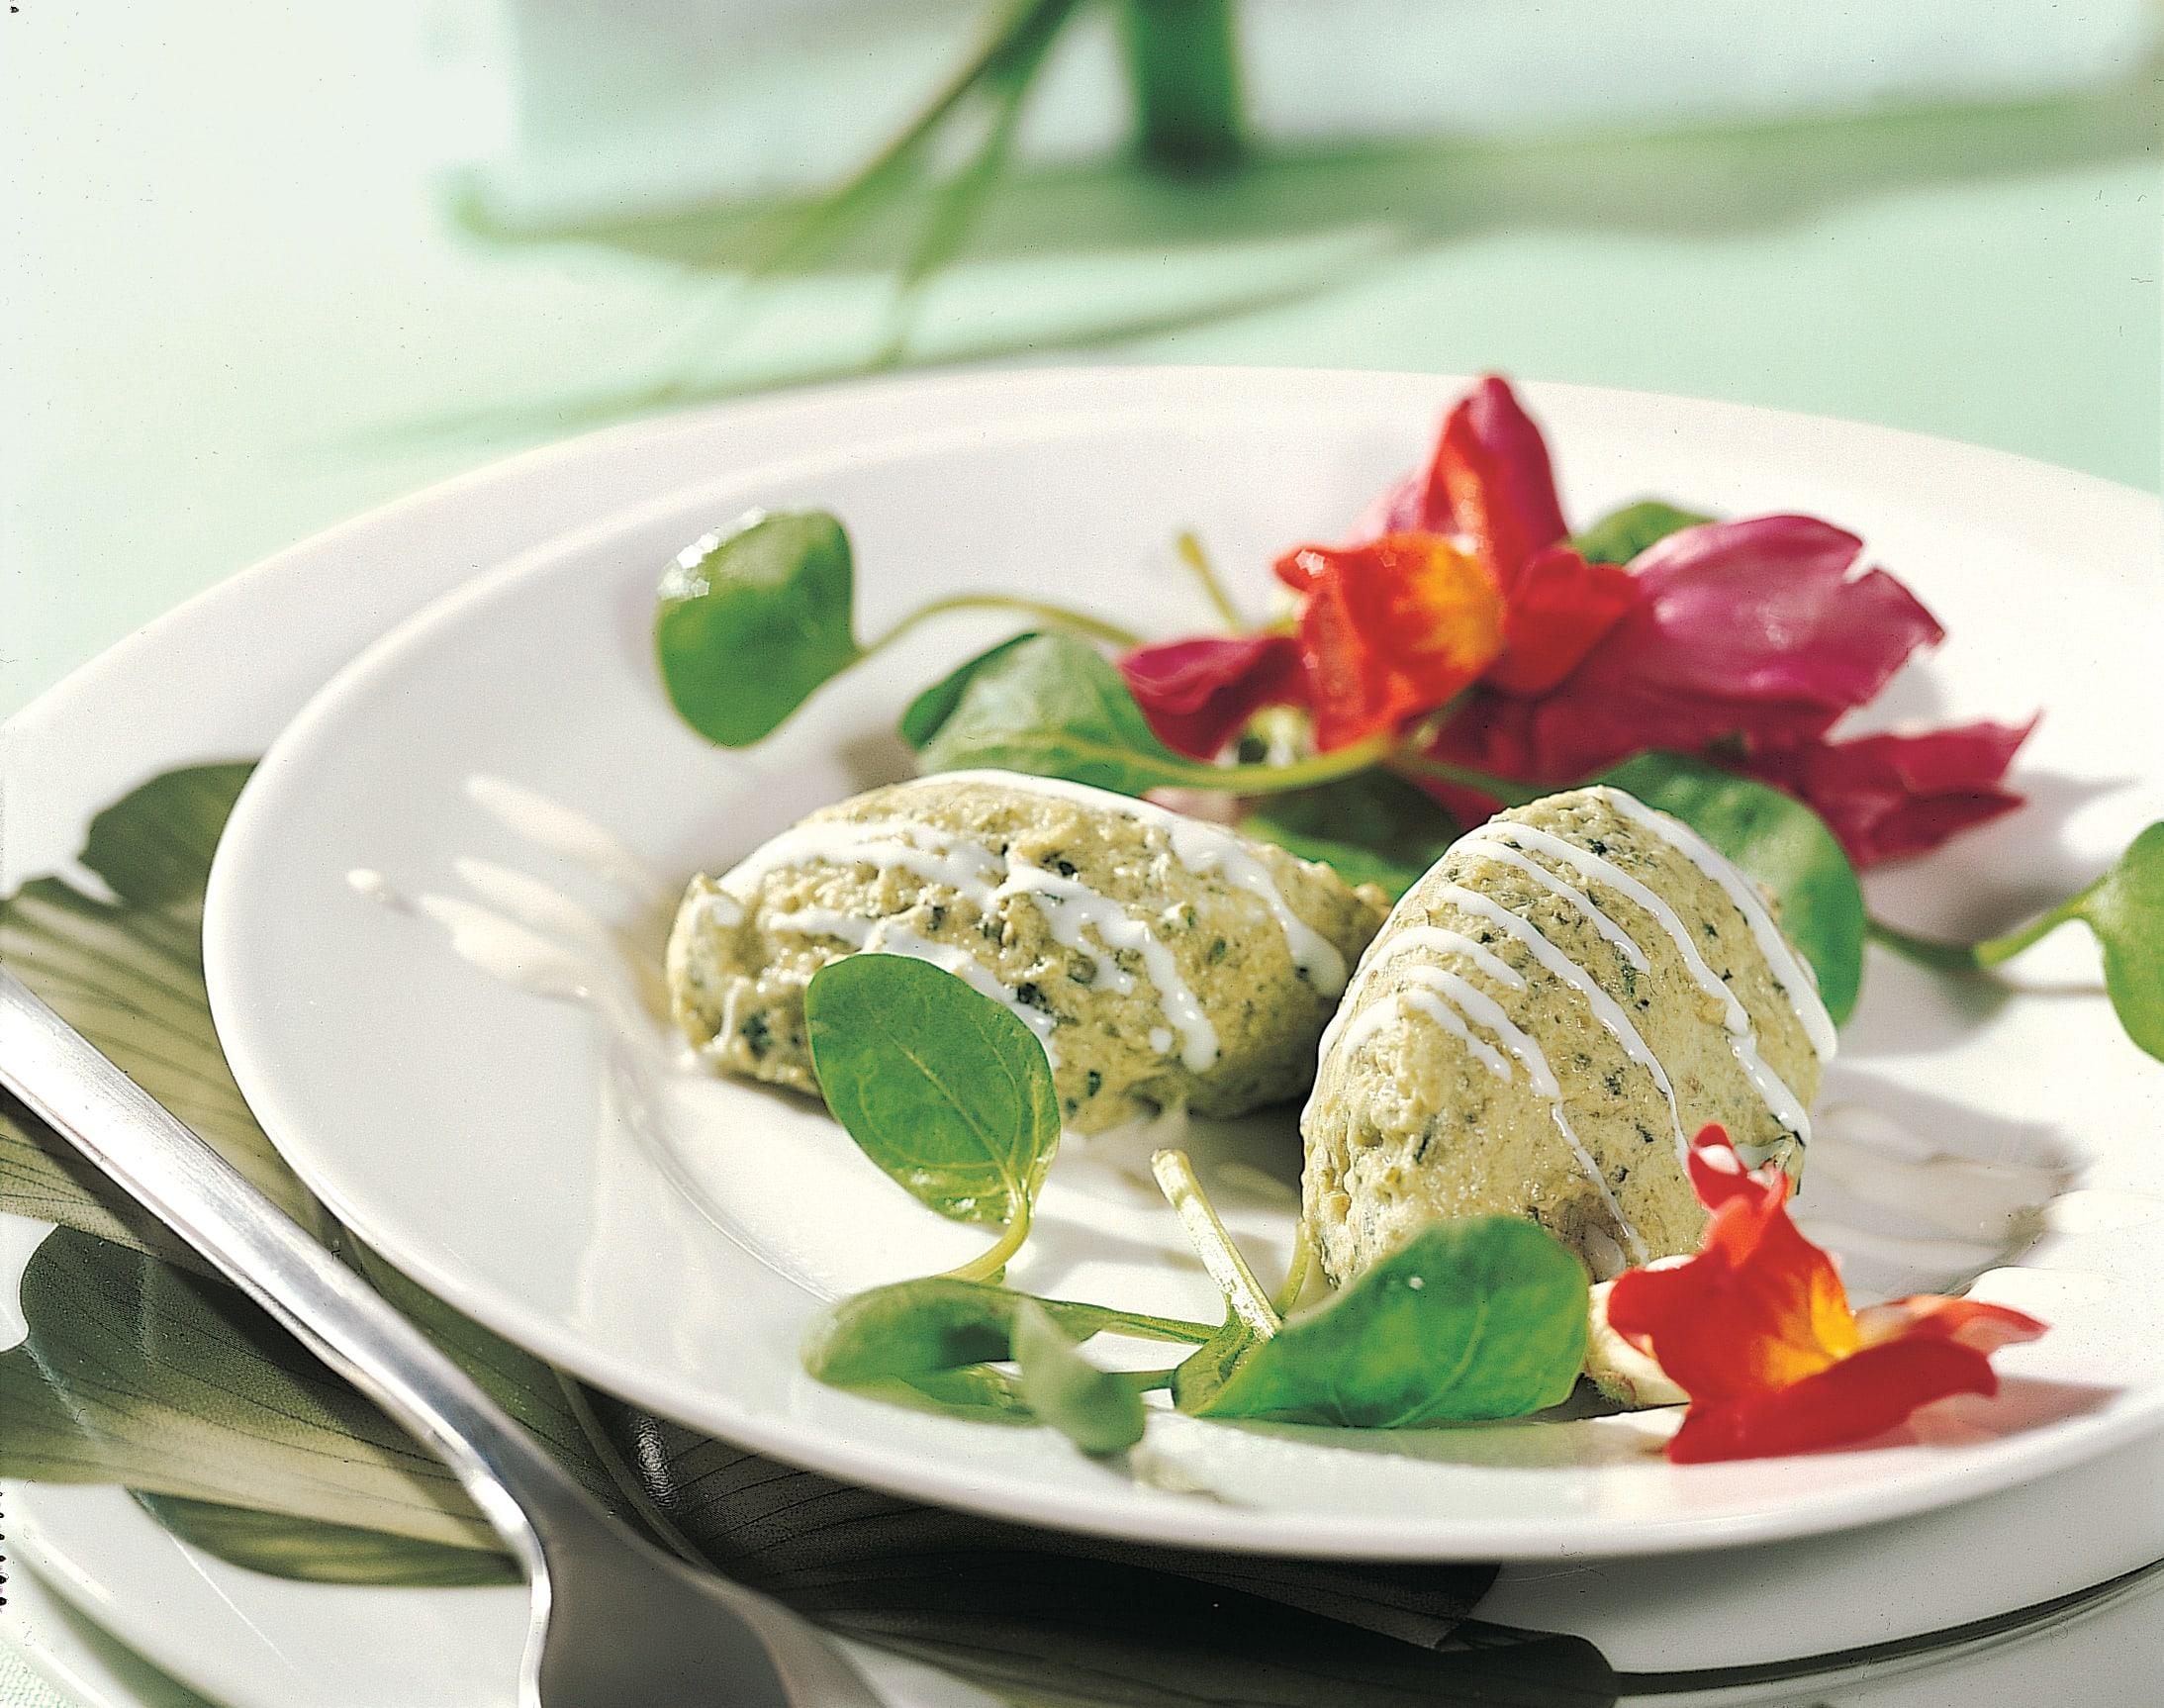 Zucchini-Mousse auf Schnittsalat